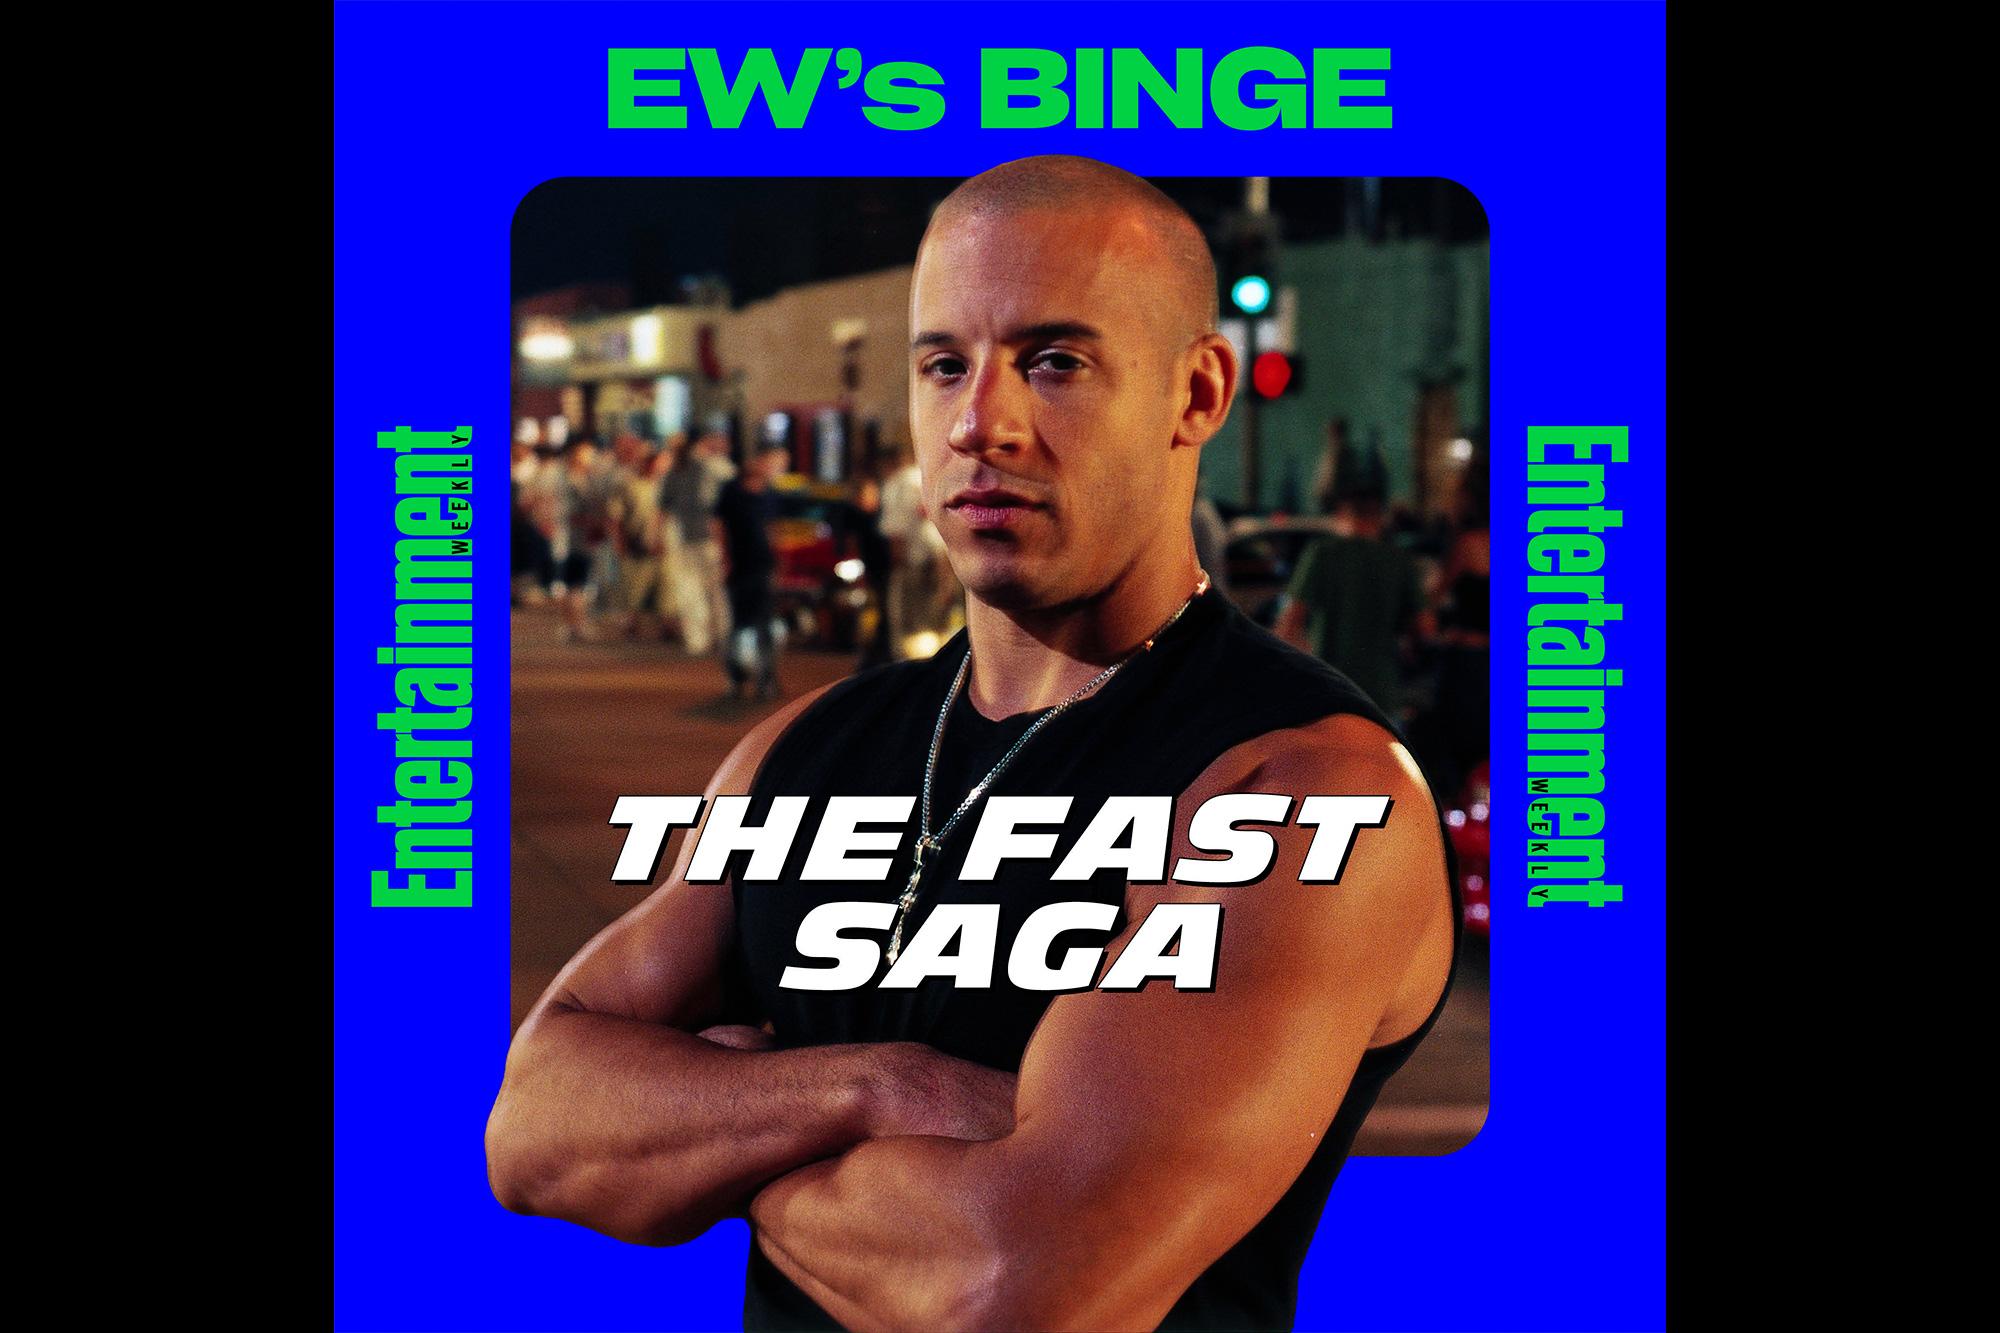 EW Binge